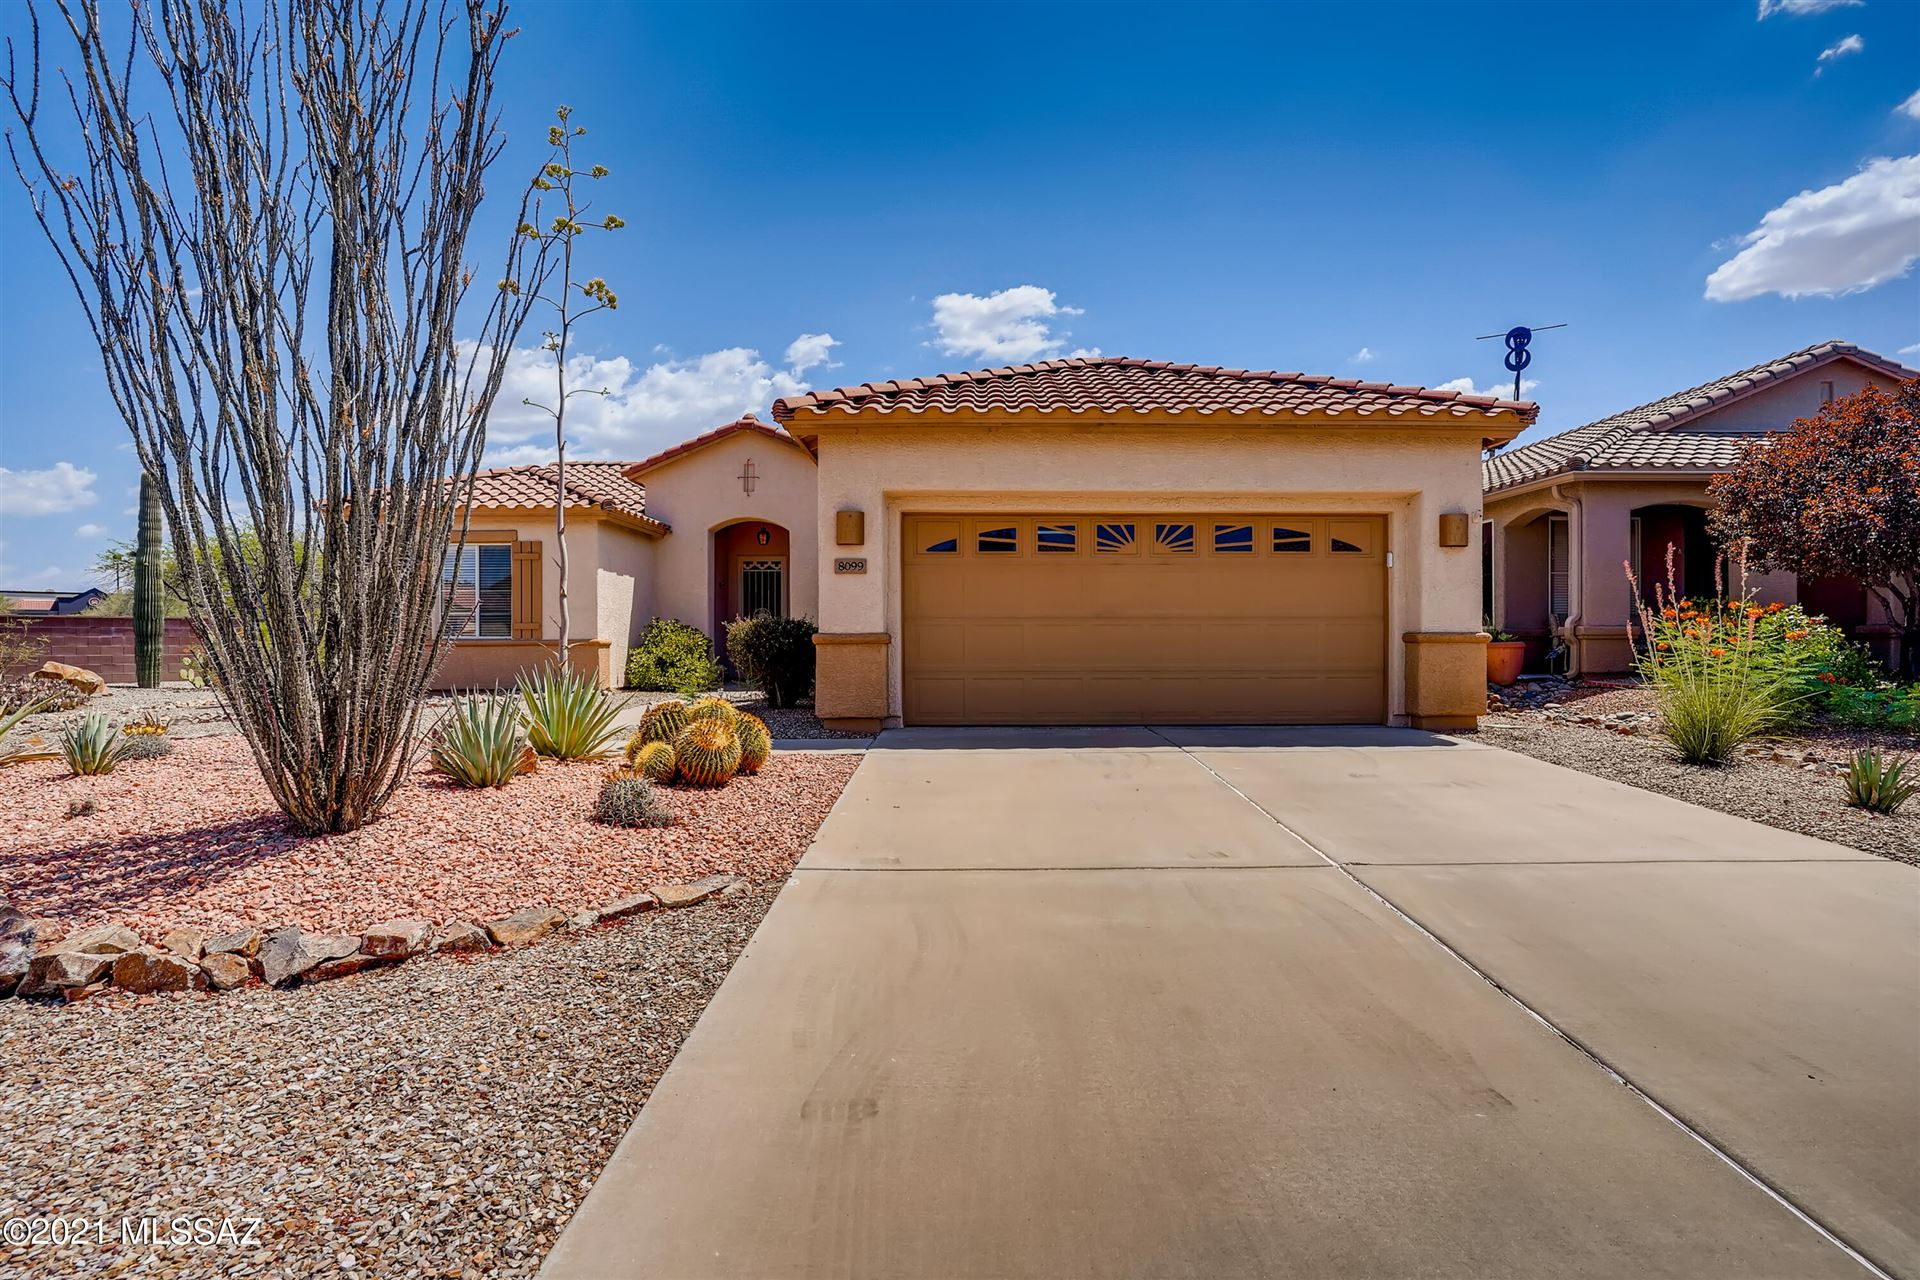 8099 W Blowing Tumbleweed Place, Tucson, AZ 85743 - MLS#: 22117700